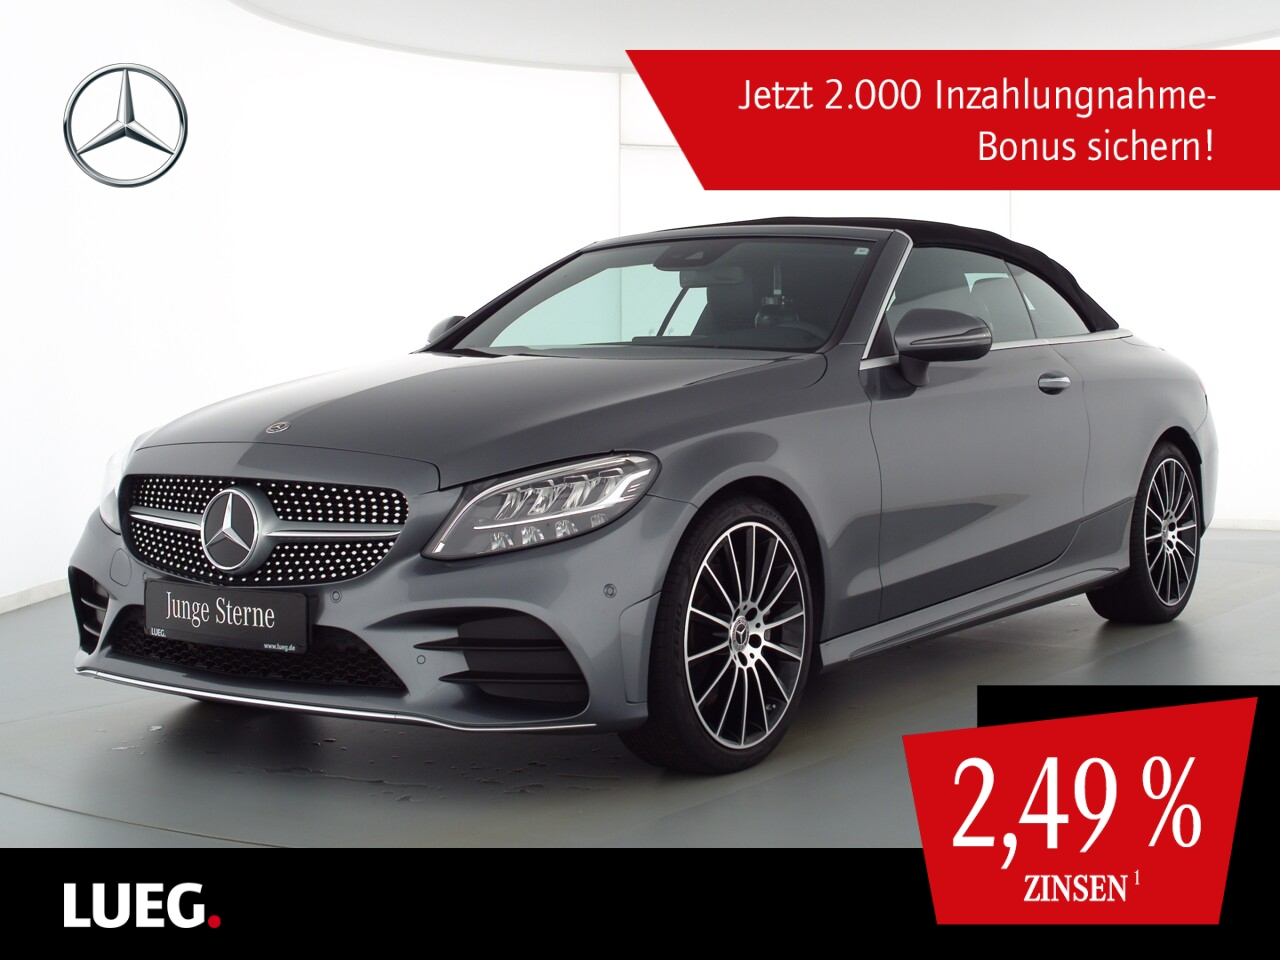 Mercedes-Benz C 220 d Cabrio AMG+Burm+LED-HP+19+CabK+Distr+RFK, Jahr 2020, Diesel